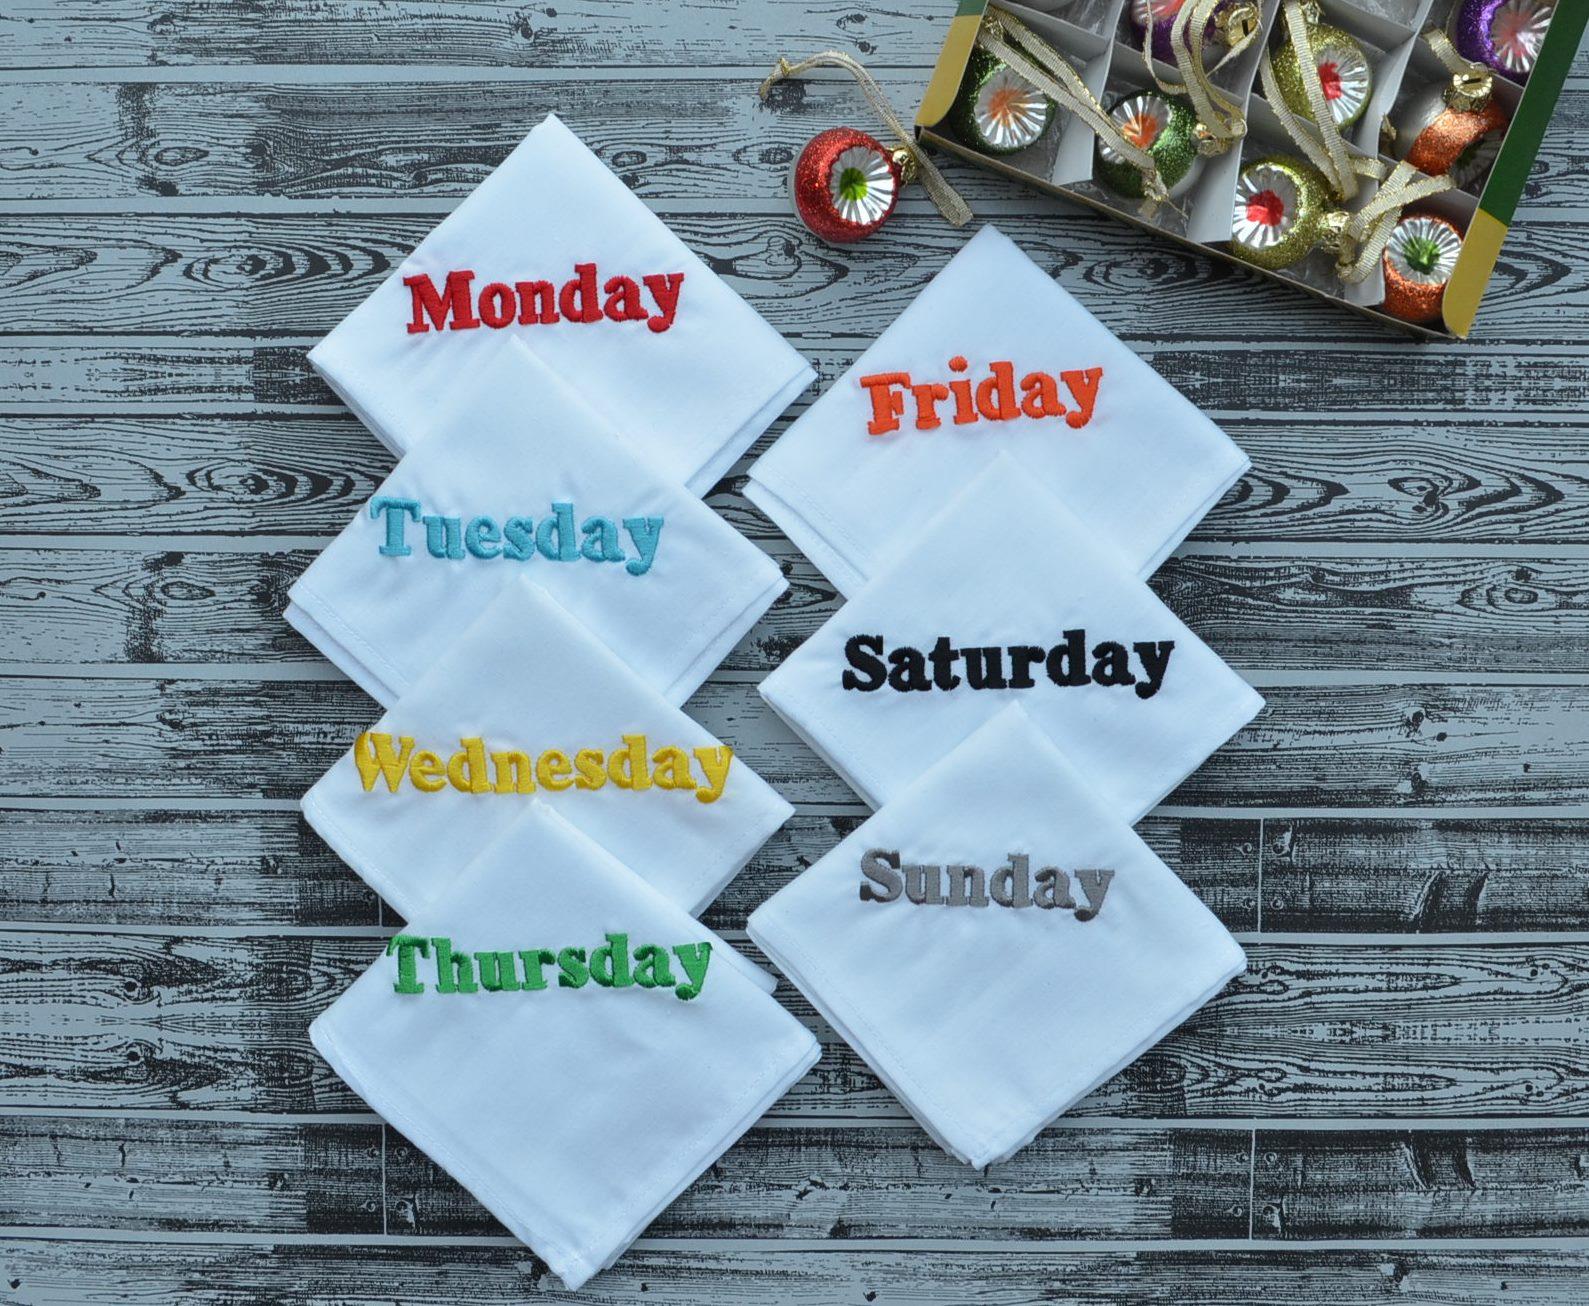 days-of-the-week-handkerchiefs-for-men-the-hank-2.jpg